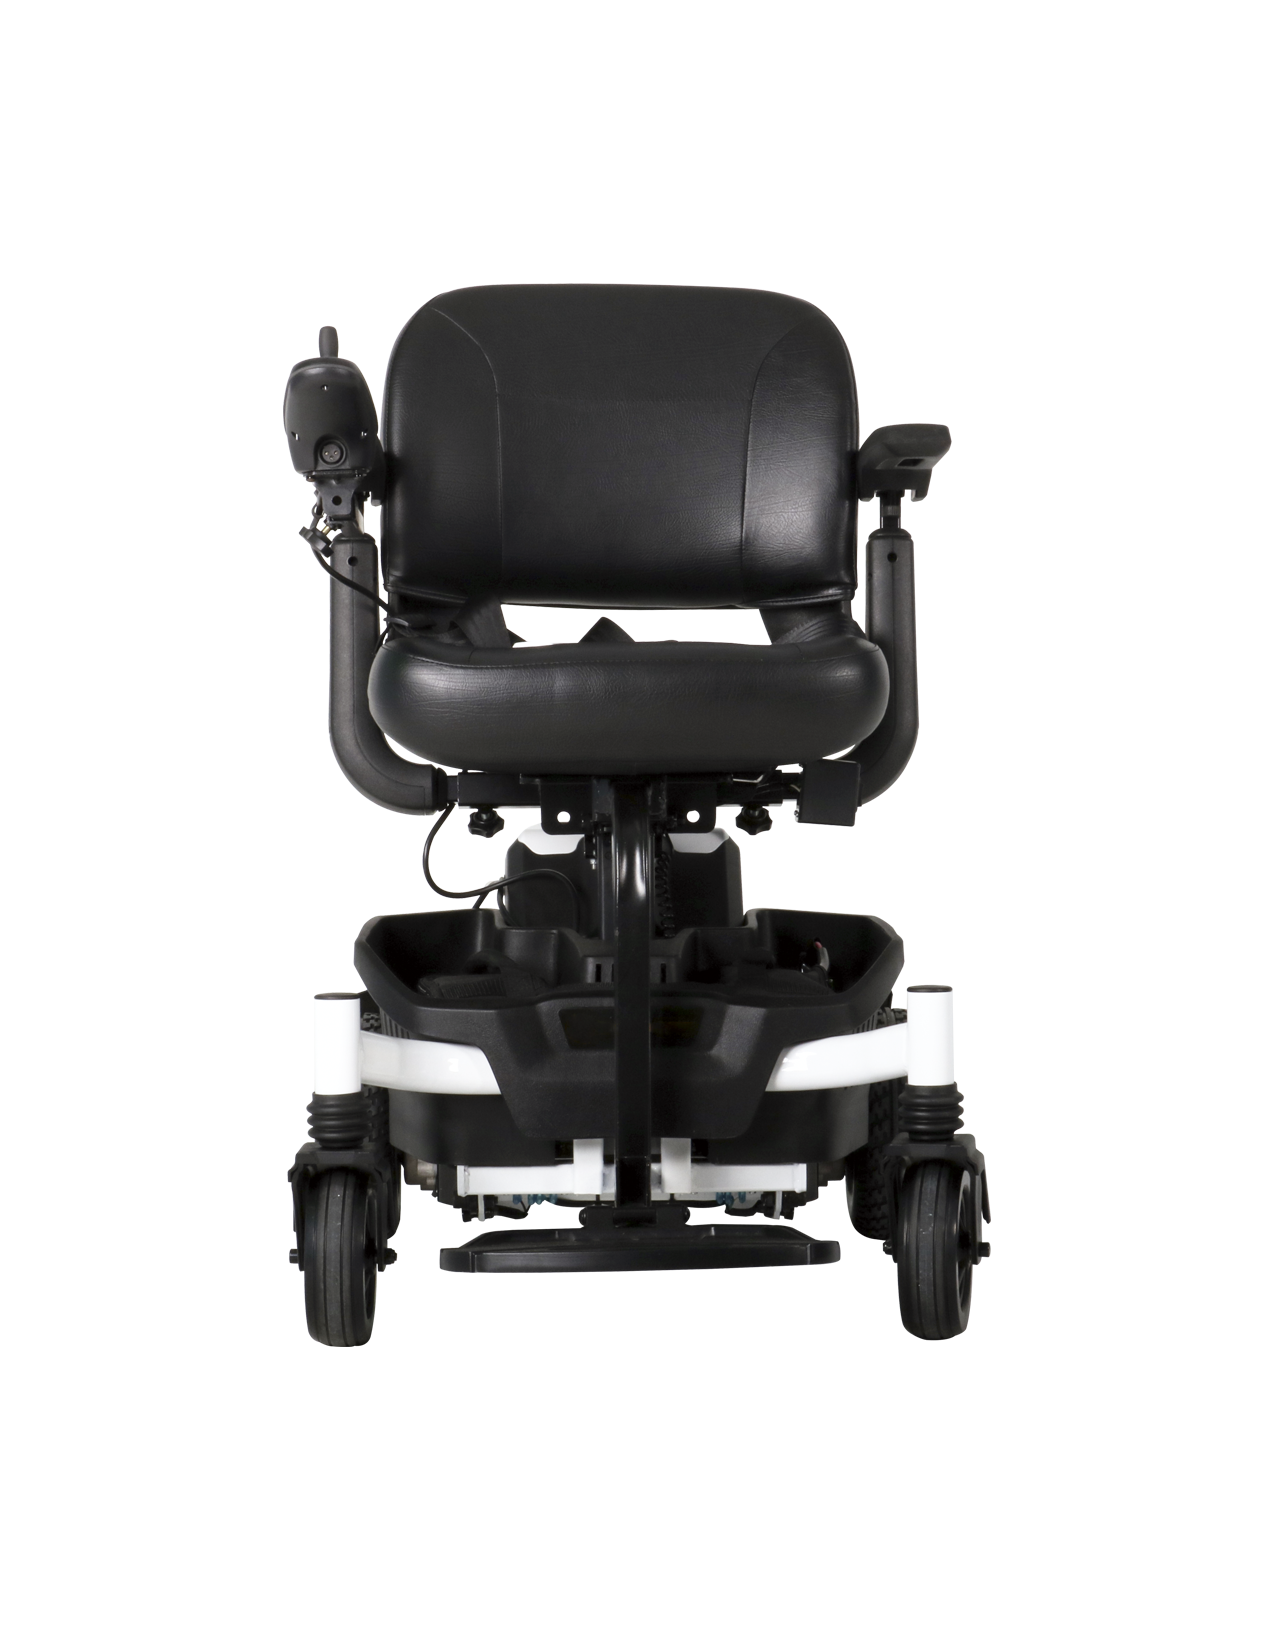 EXCEL-mobility--E-smart---Elektrorollstuhl--intelligente-Technik-und-enorm-allteagstauglich